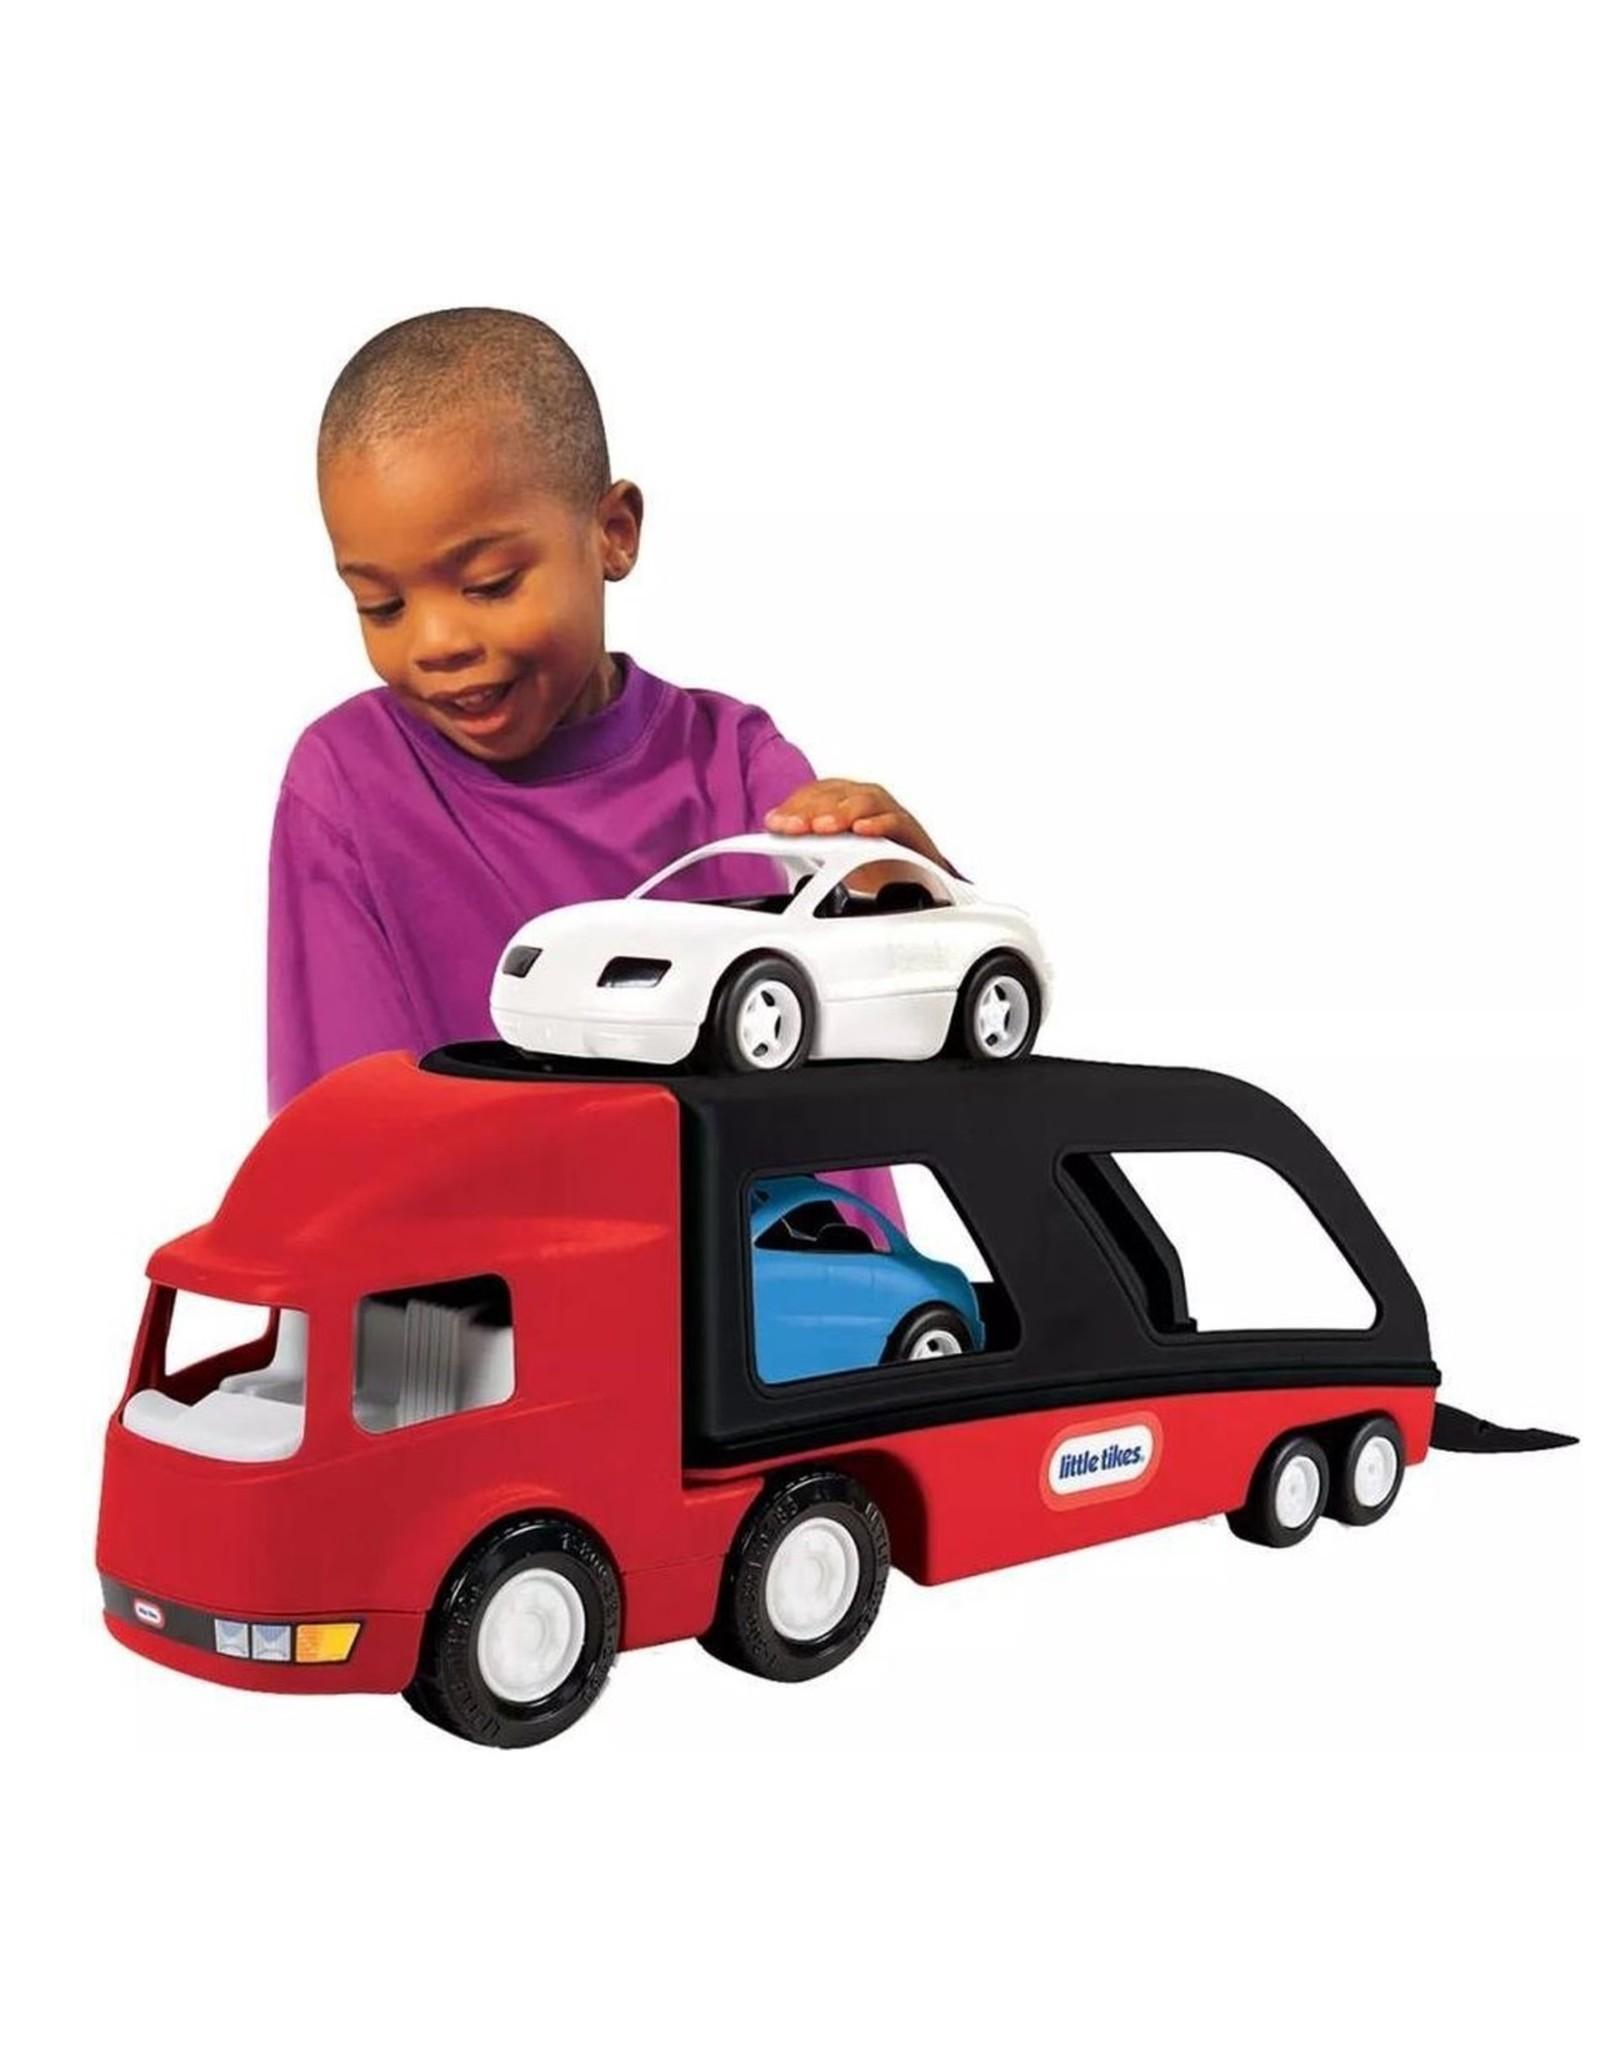 Little Tikes - Grote Autotransporter - Rood/Zwart